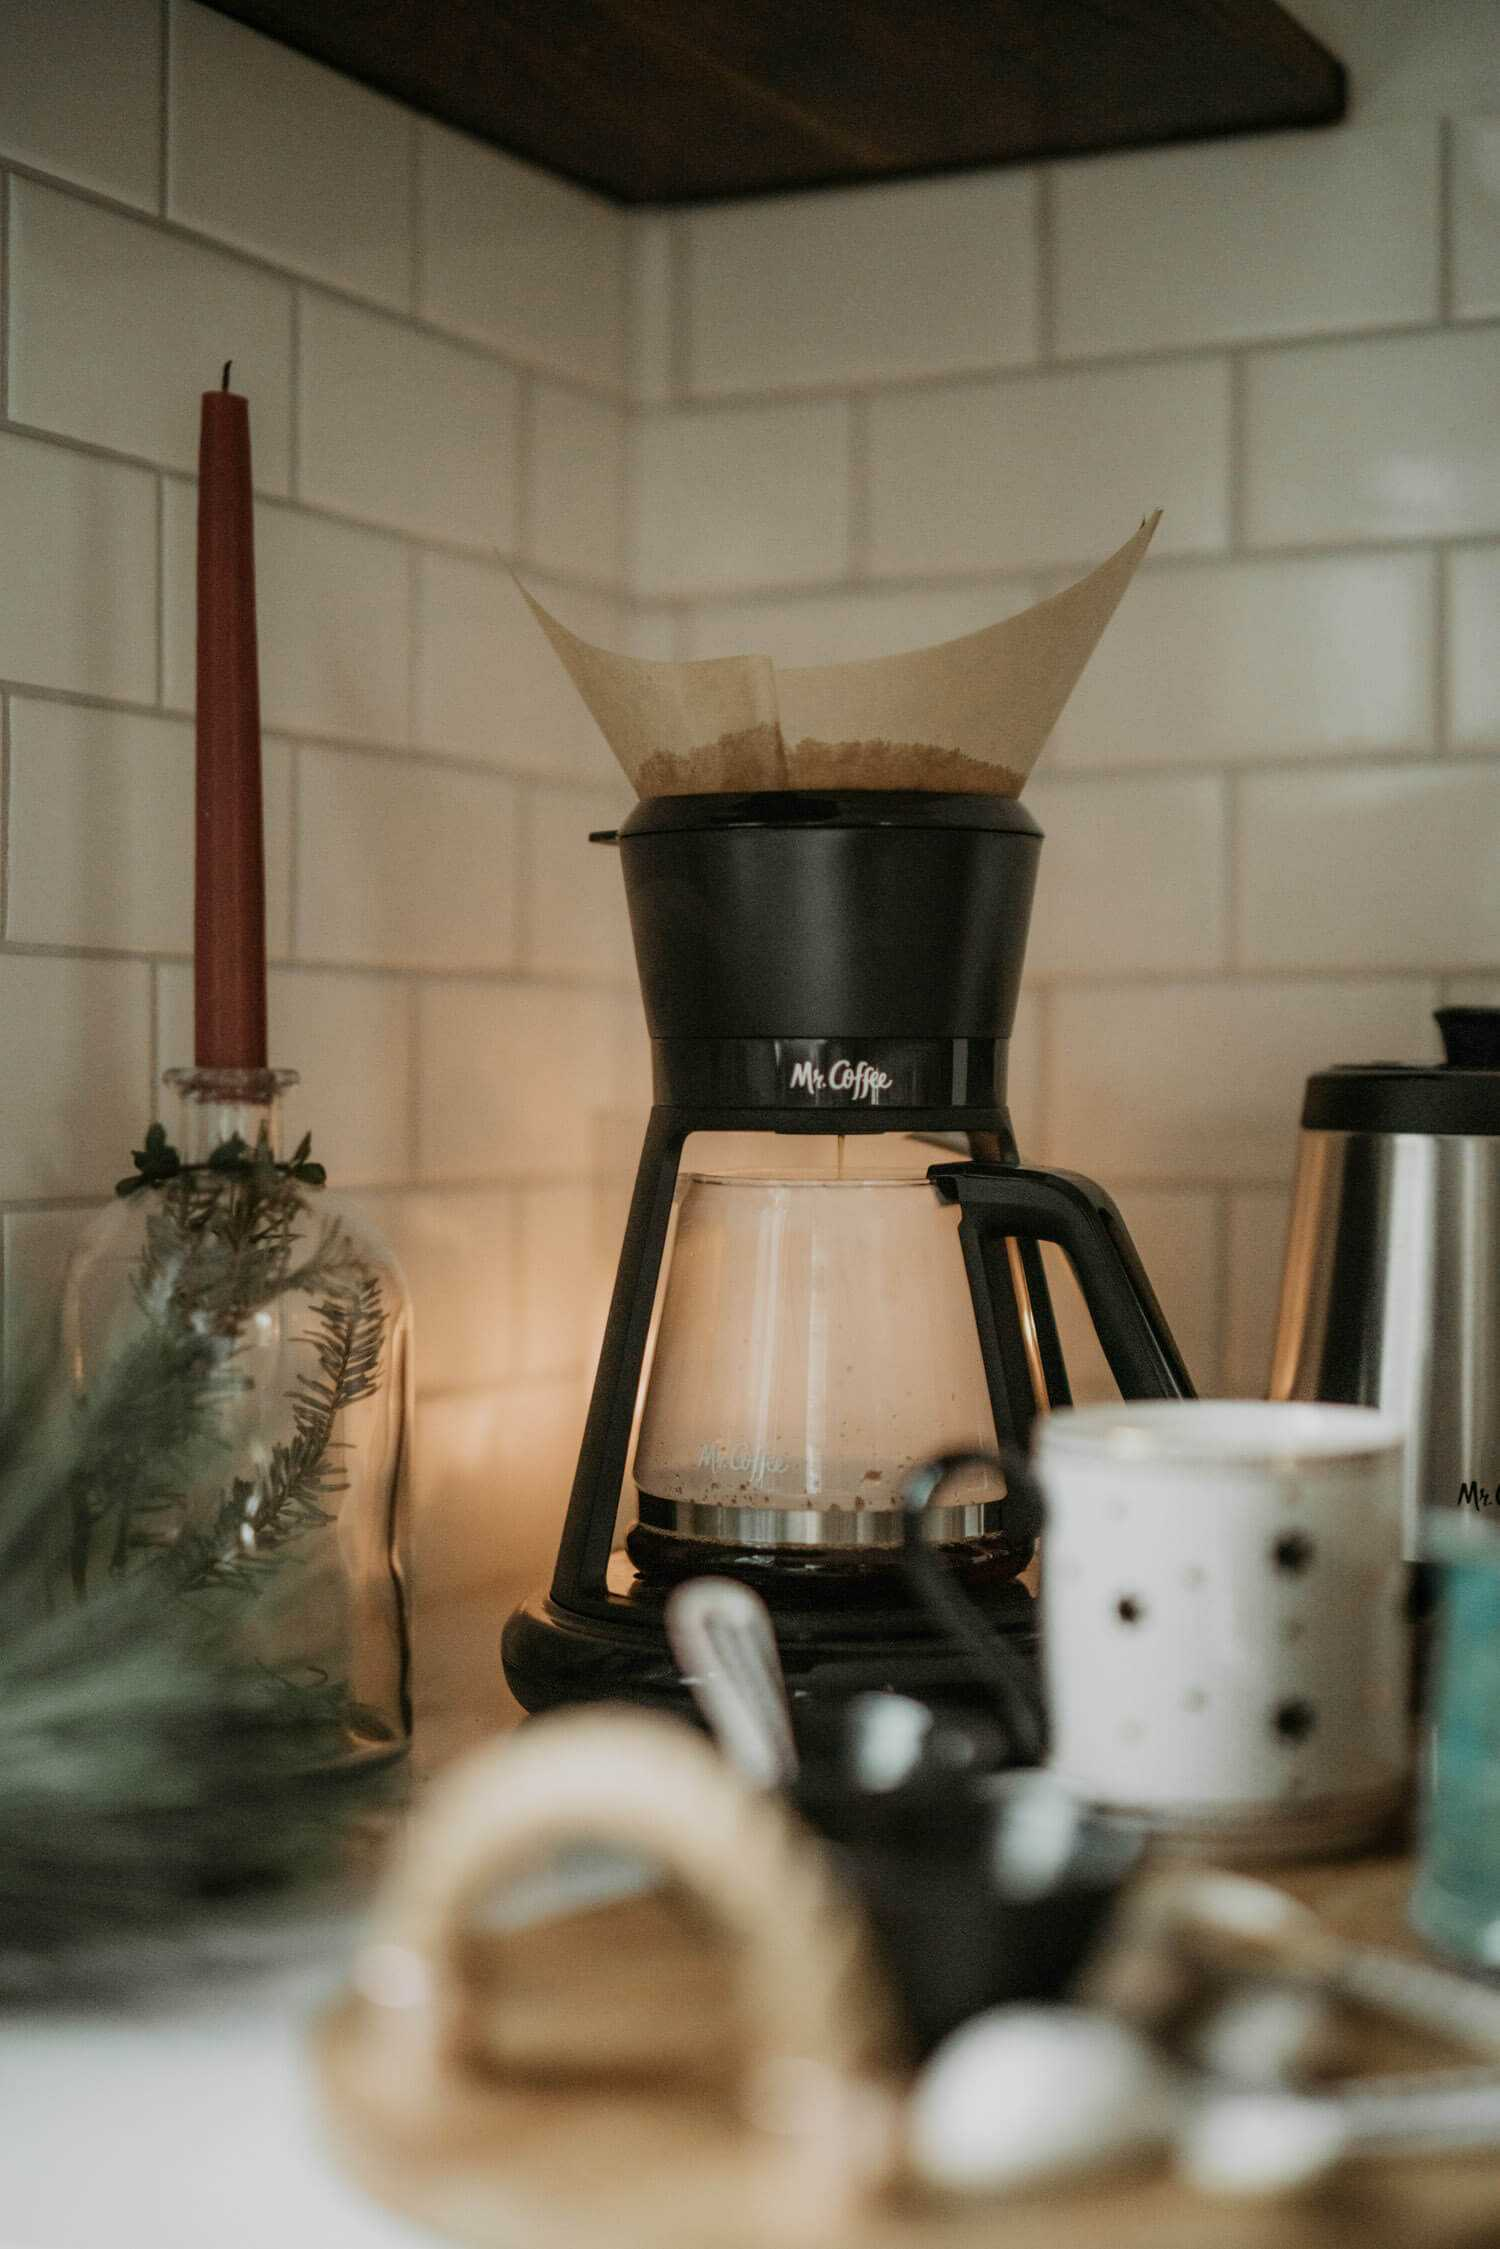 Mr Coffee 5